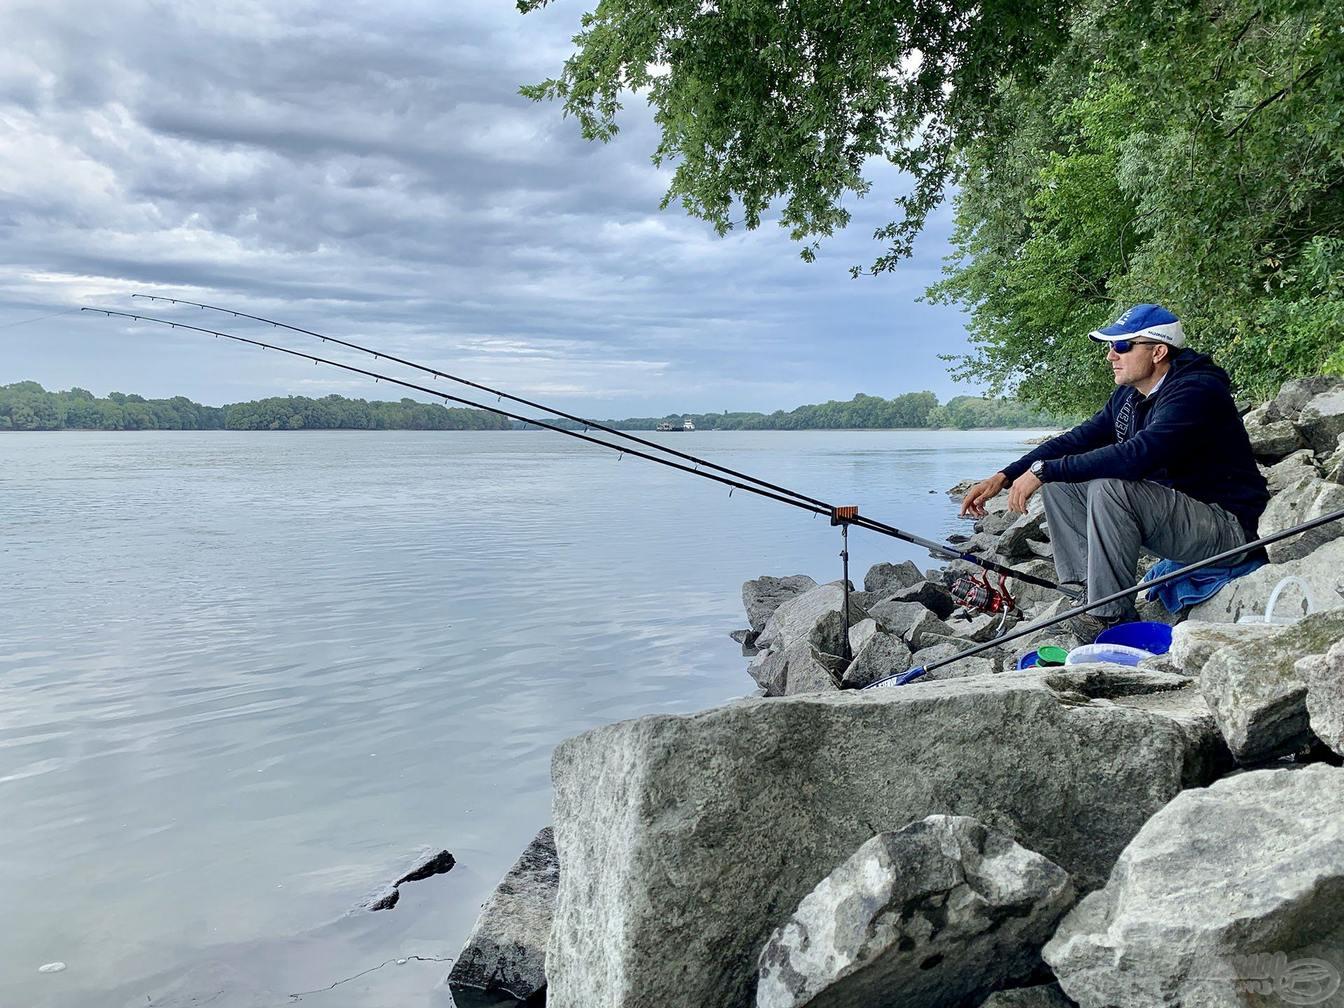 Lov na řece s Haldorado big river